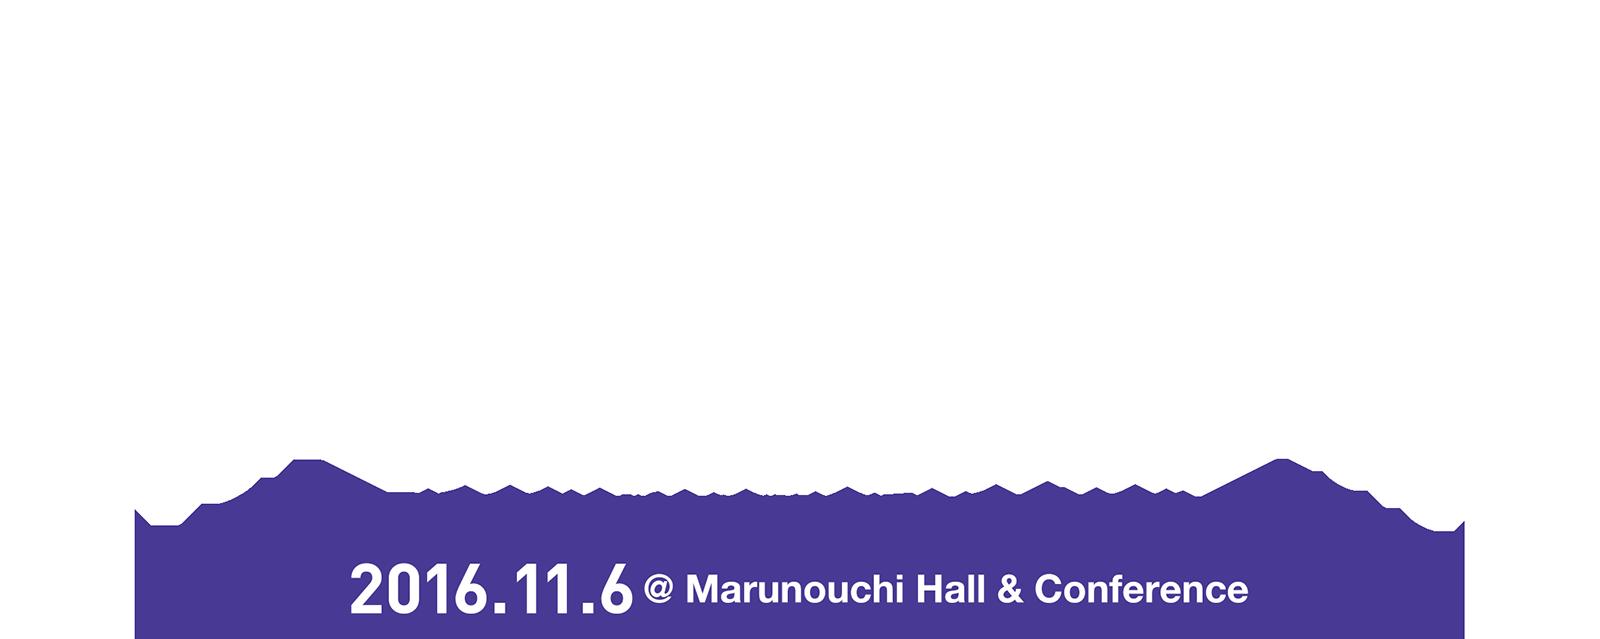 TOKYO STARTUP GATEWAY 2016 コンテスト部門決勝大会(ファイナル)